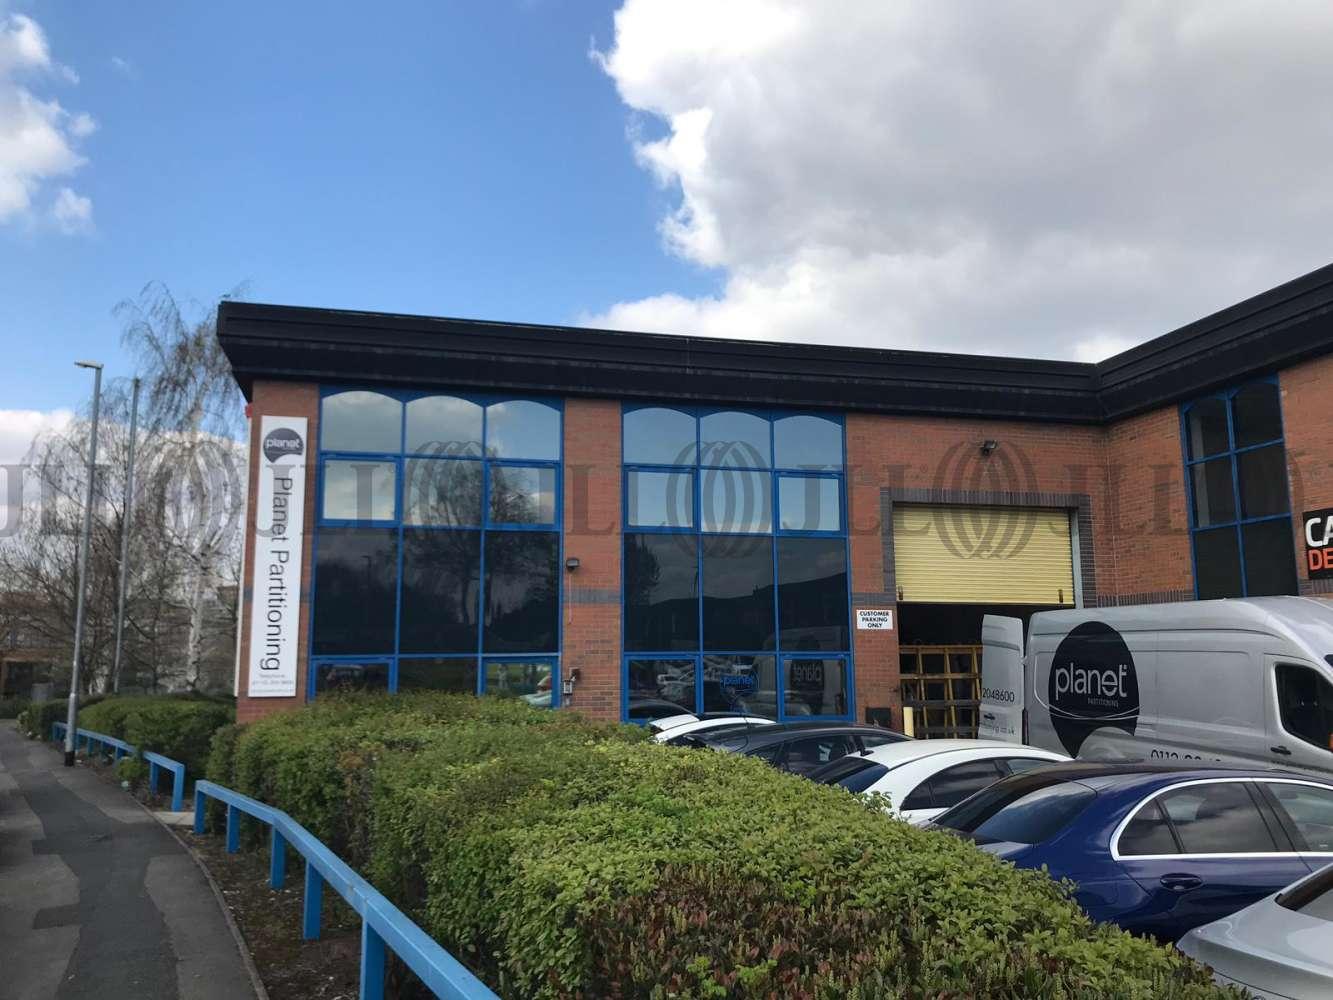 Industrial and logistics Leeds, LS11 5LN - Unit 3 Apex Business Park - 55